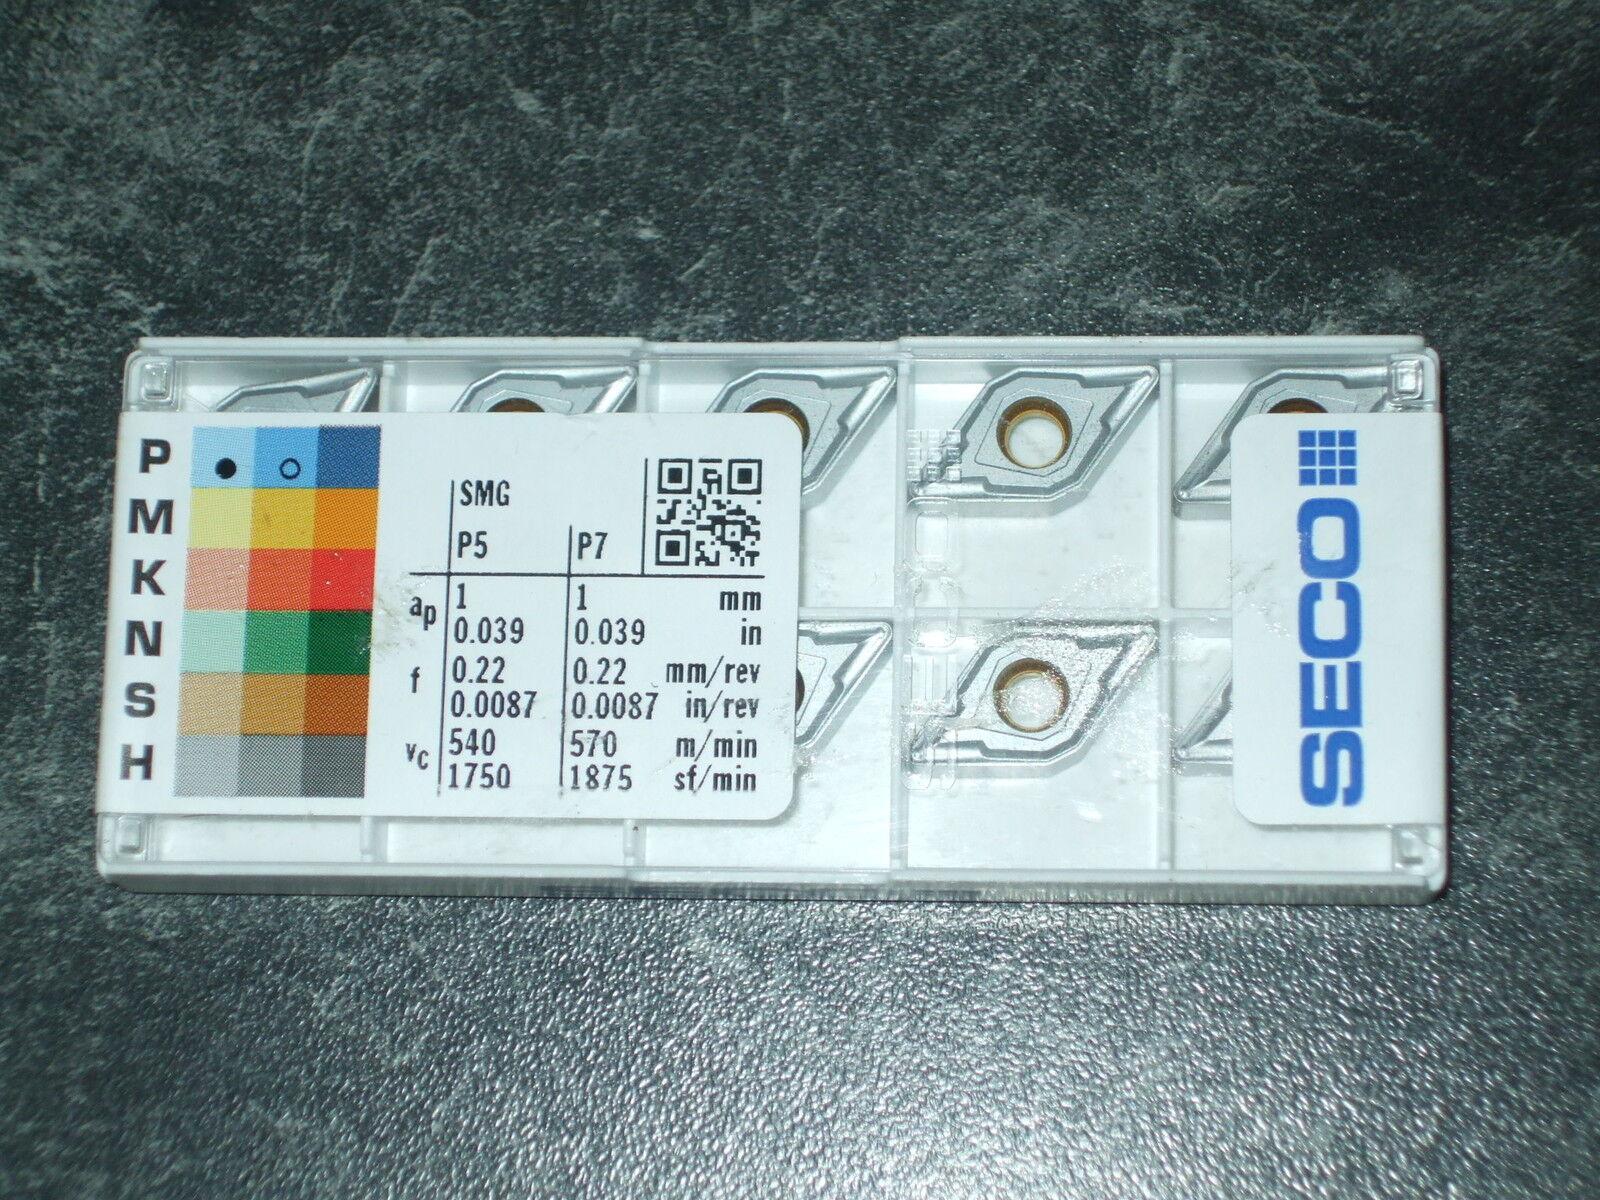 Seco 10 x DNMU110408 -MF2 TP0501